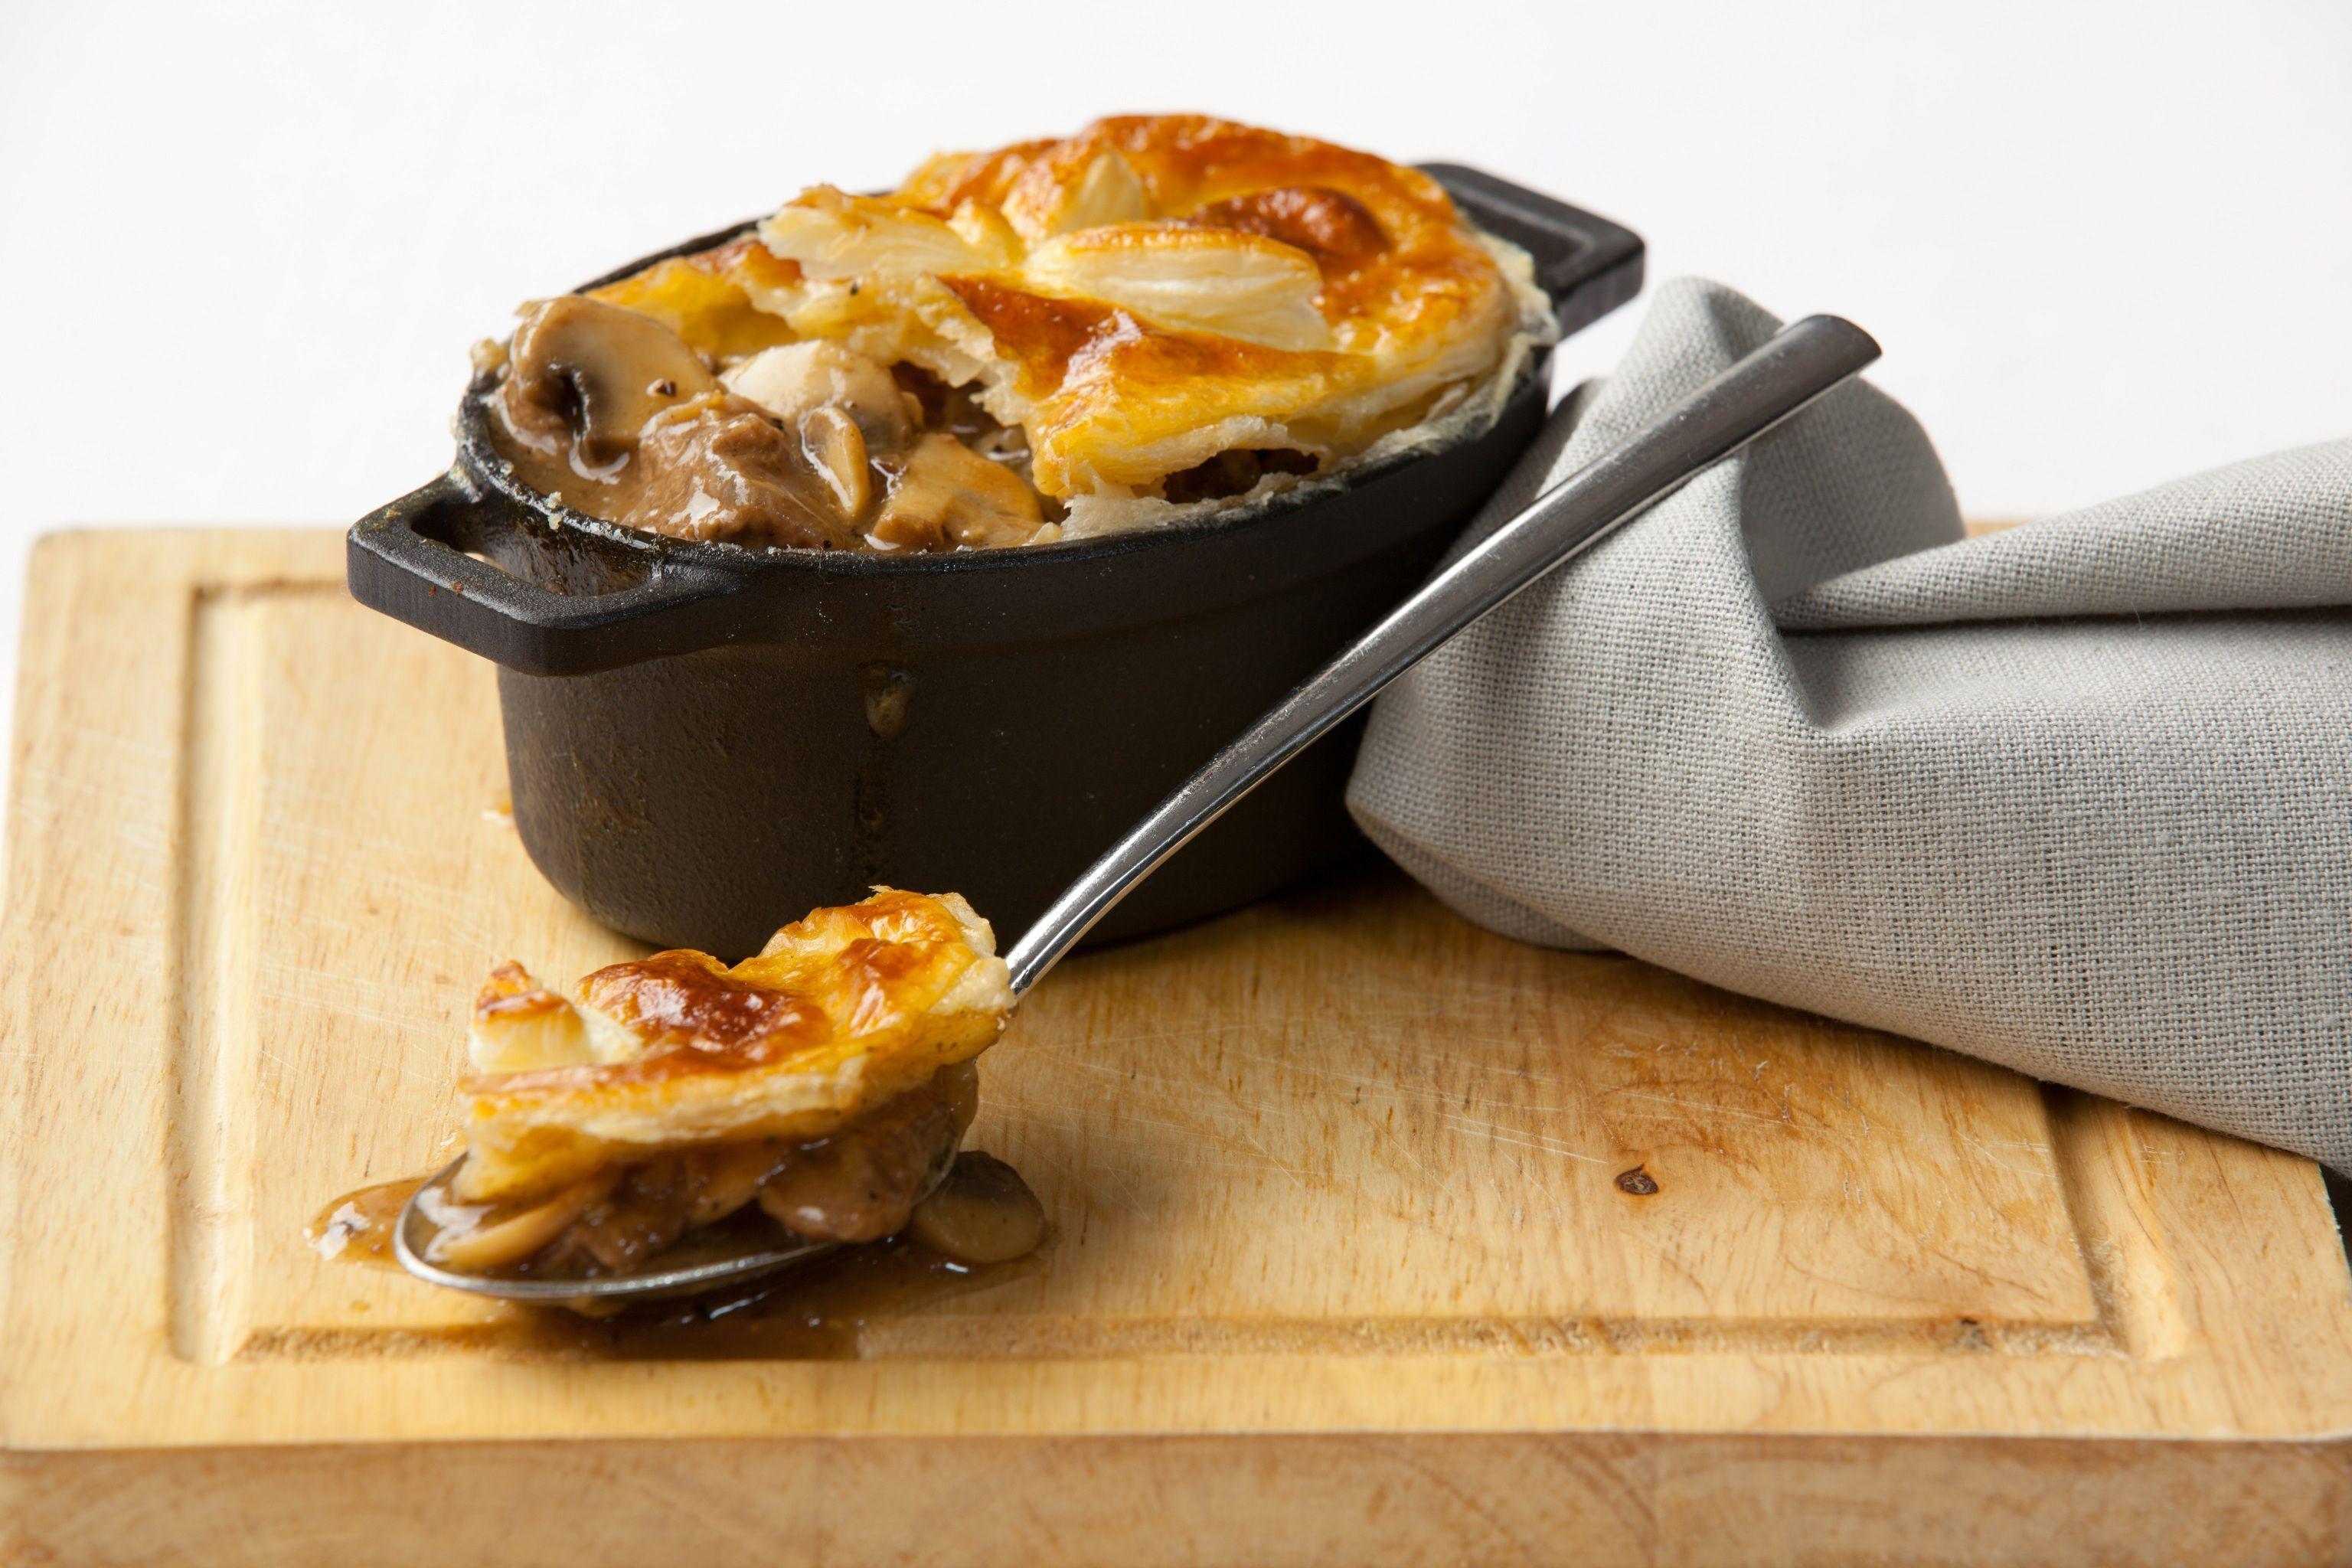 Rustic steak and mushroom pie | Recipe | Steak, mushrooms ...